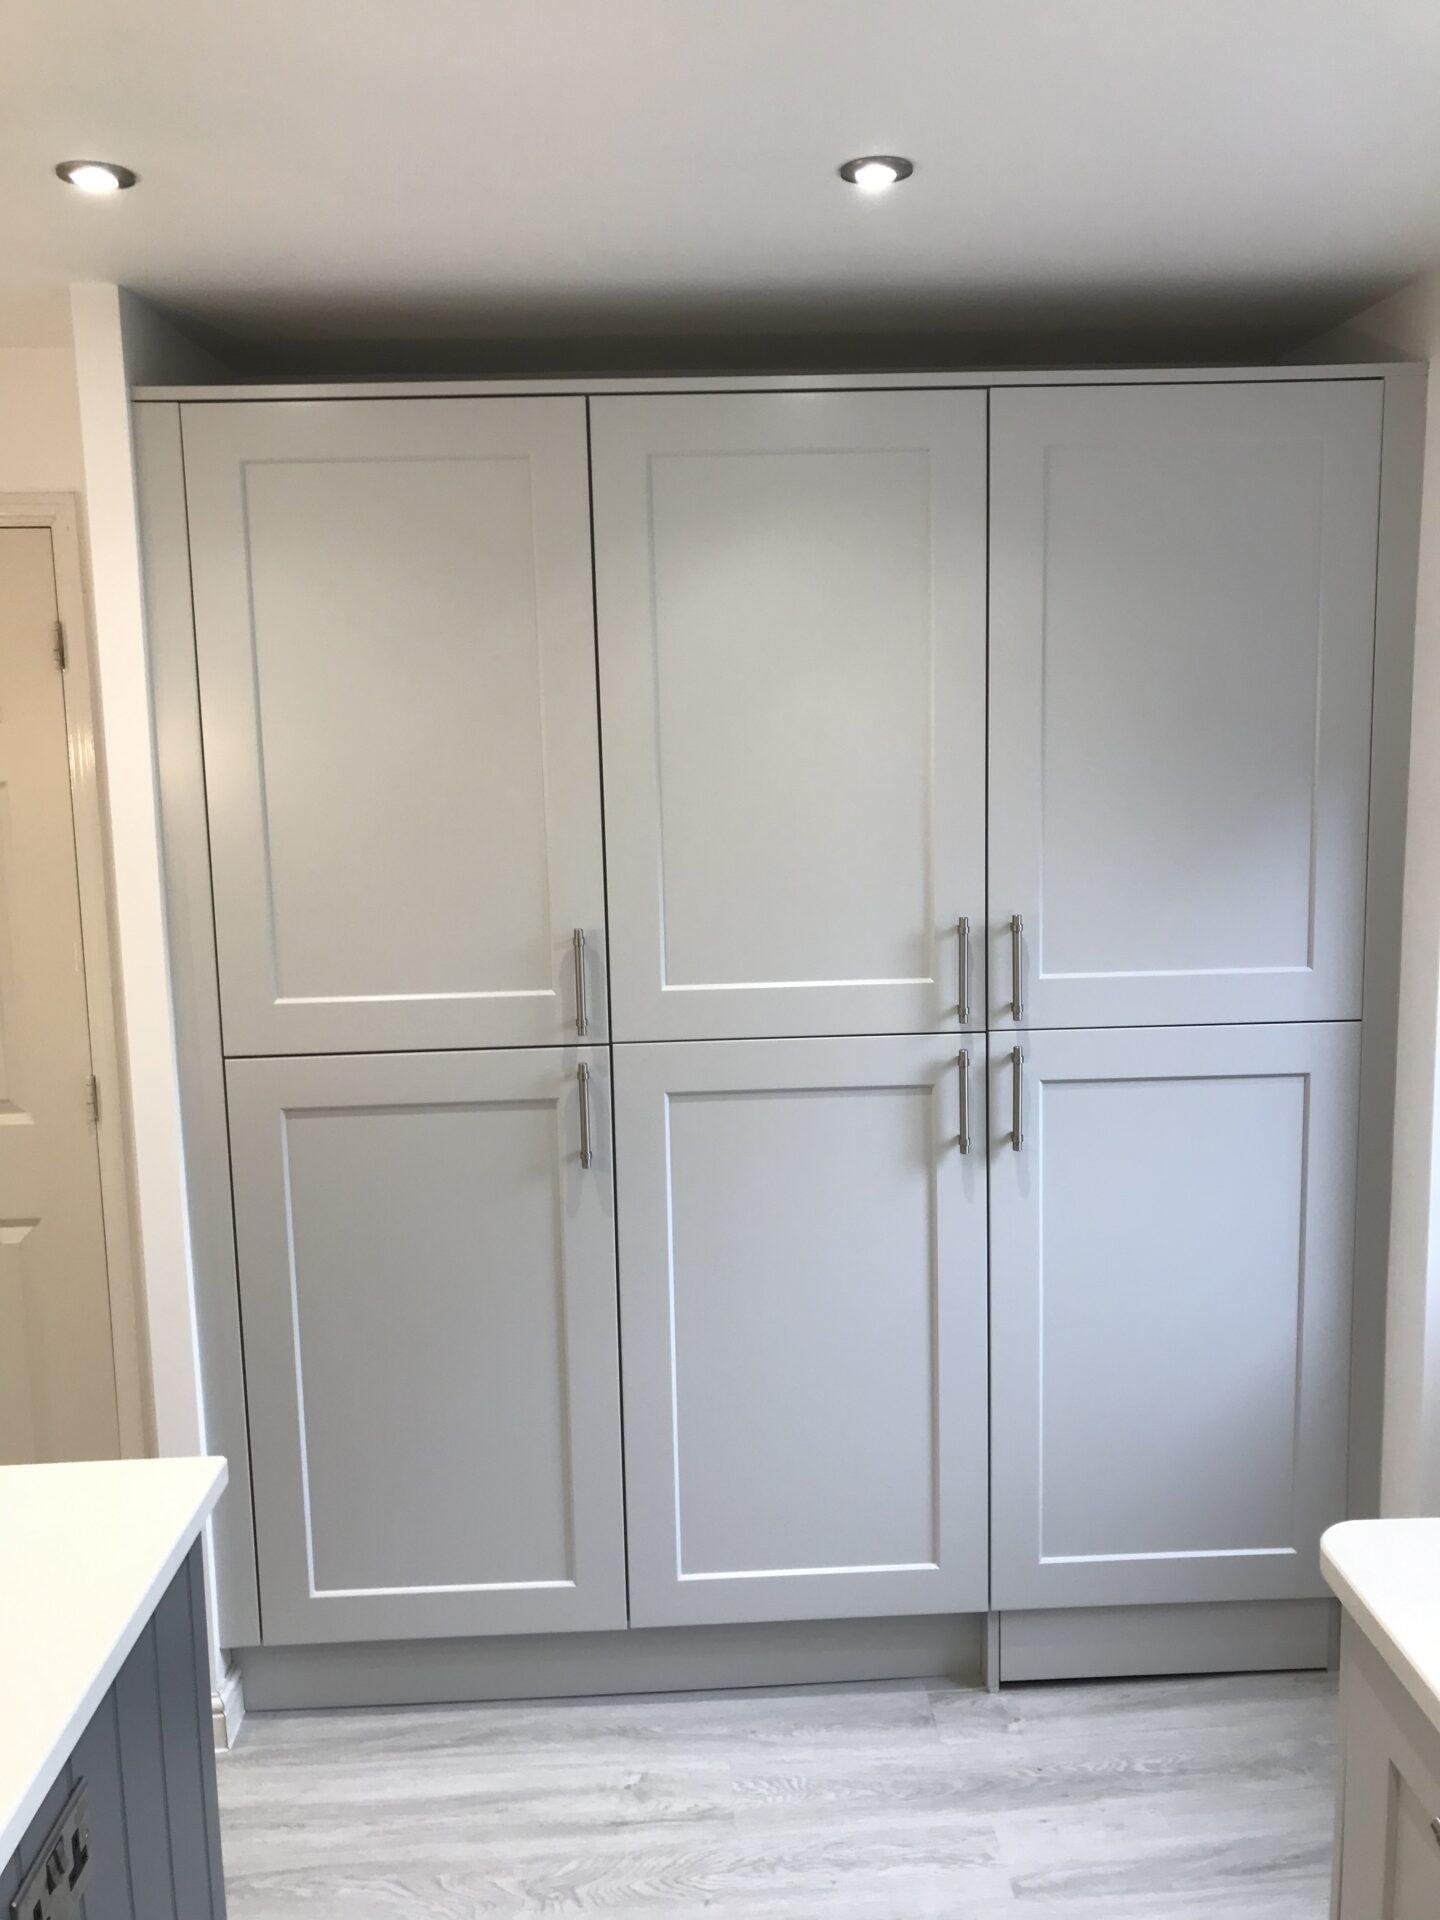 Charnwood Kitchen Utility Organiser